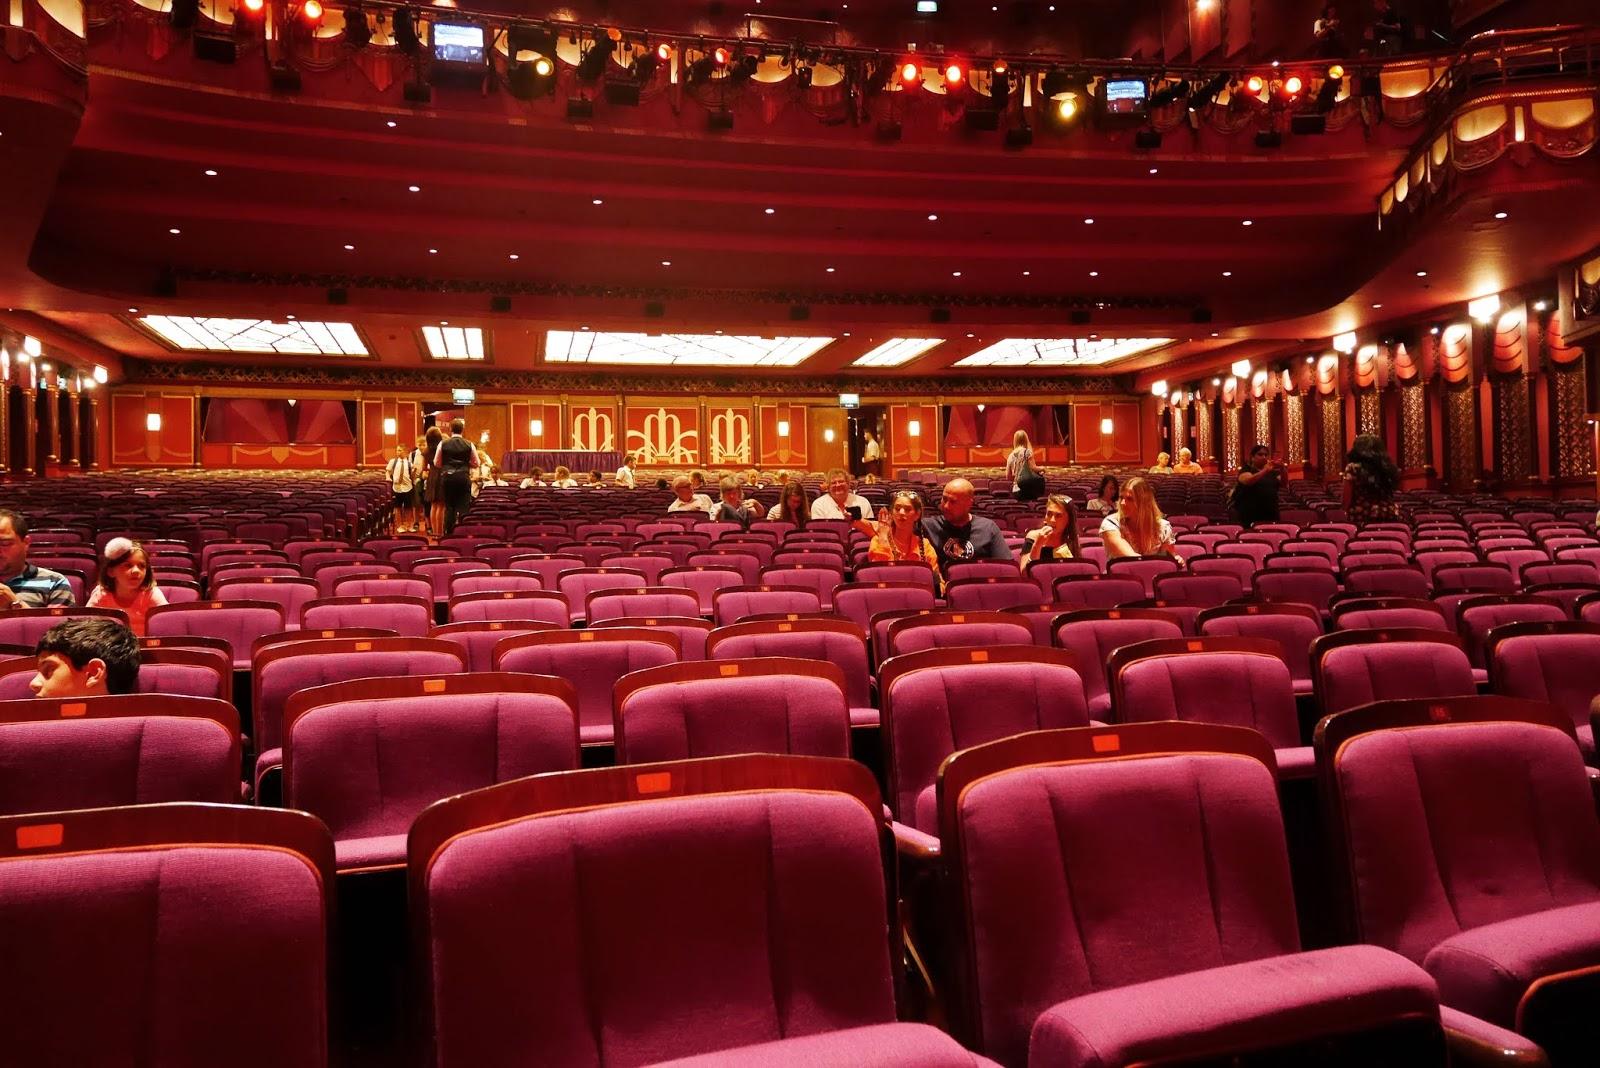 Inside the Aladdin London auditorium